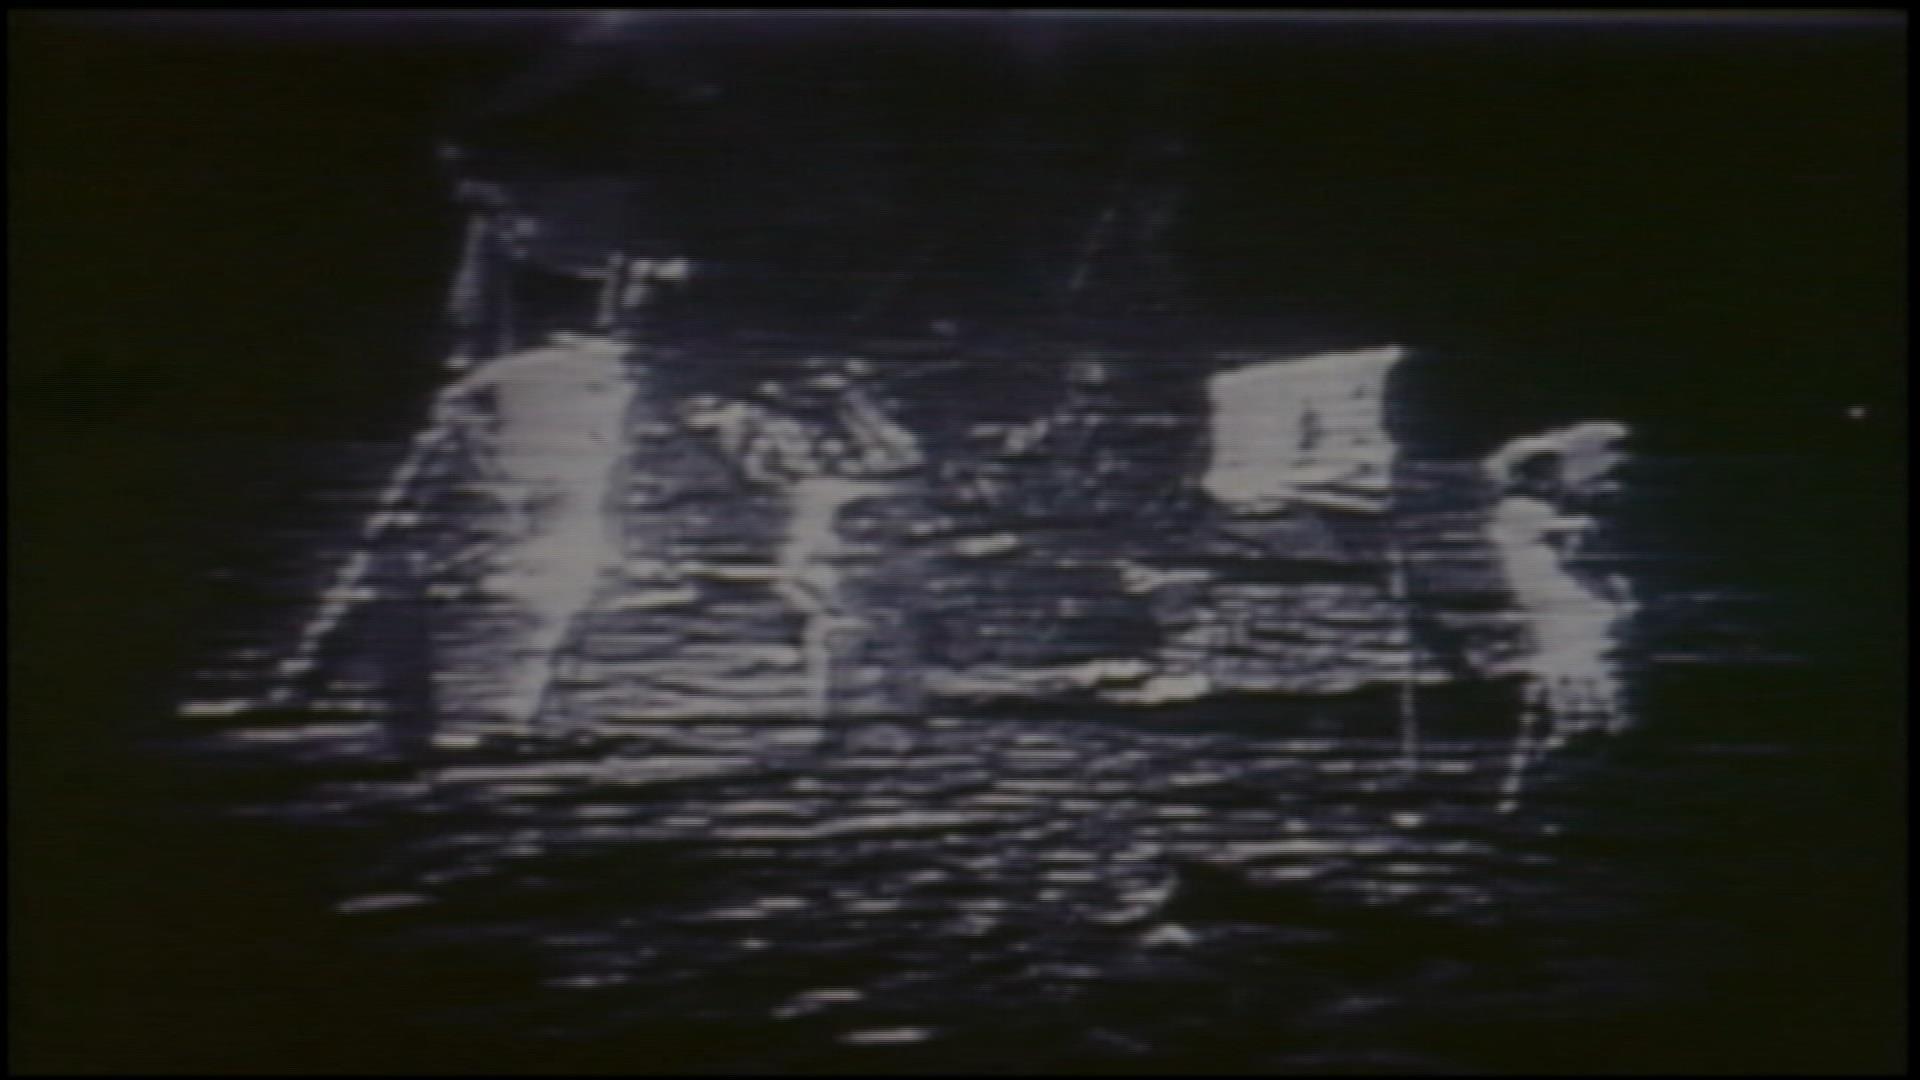 Watch Apollo 11's historic moon landing